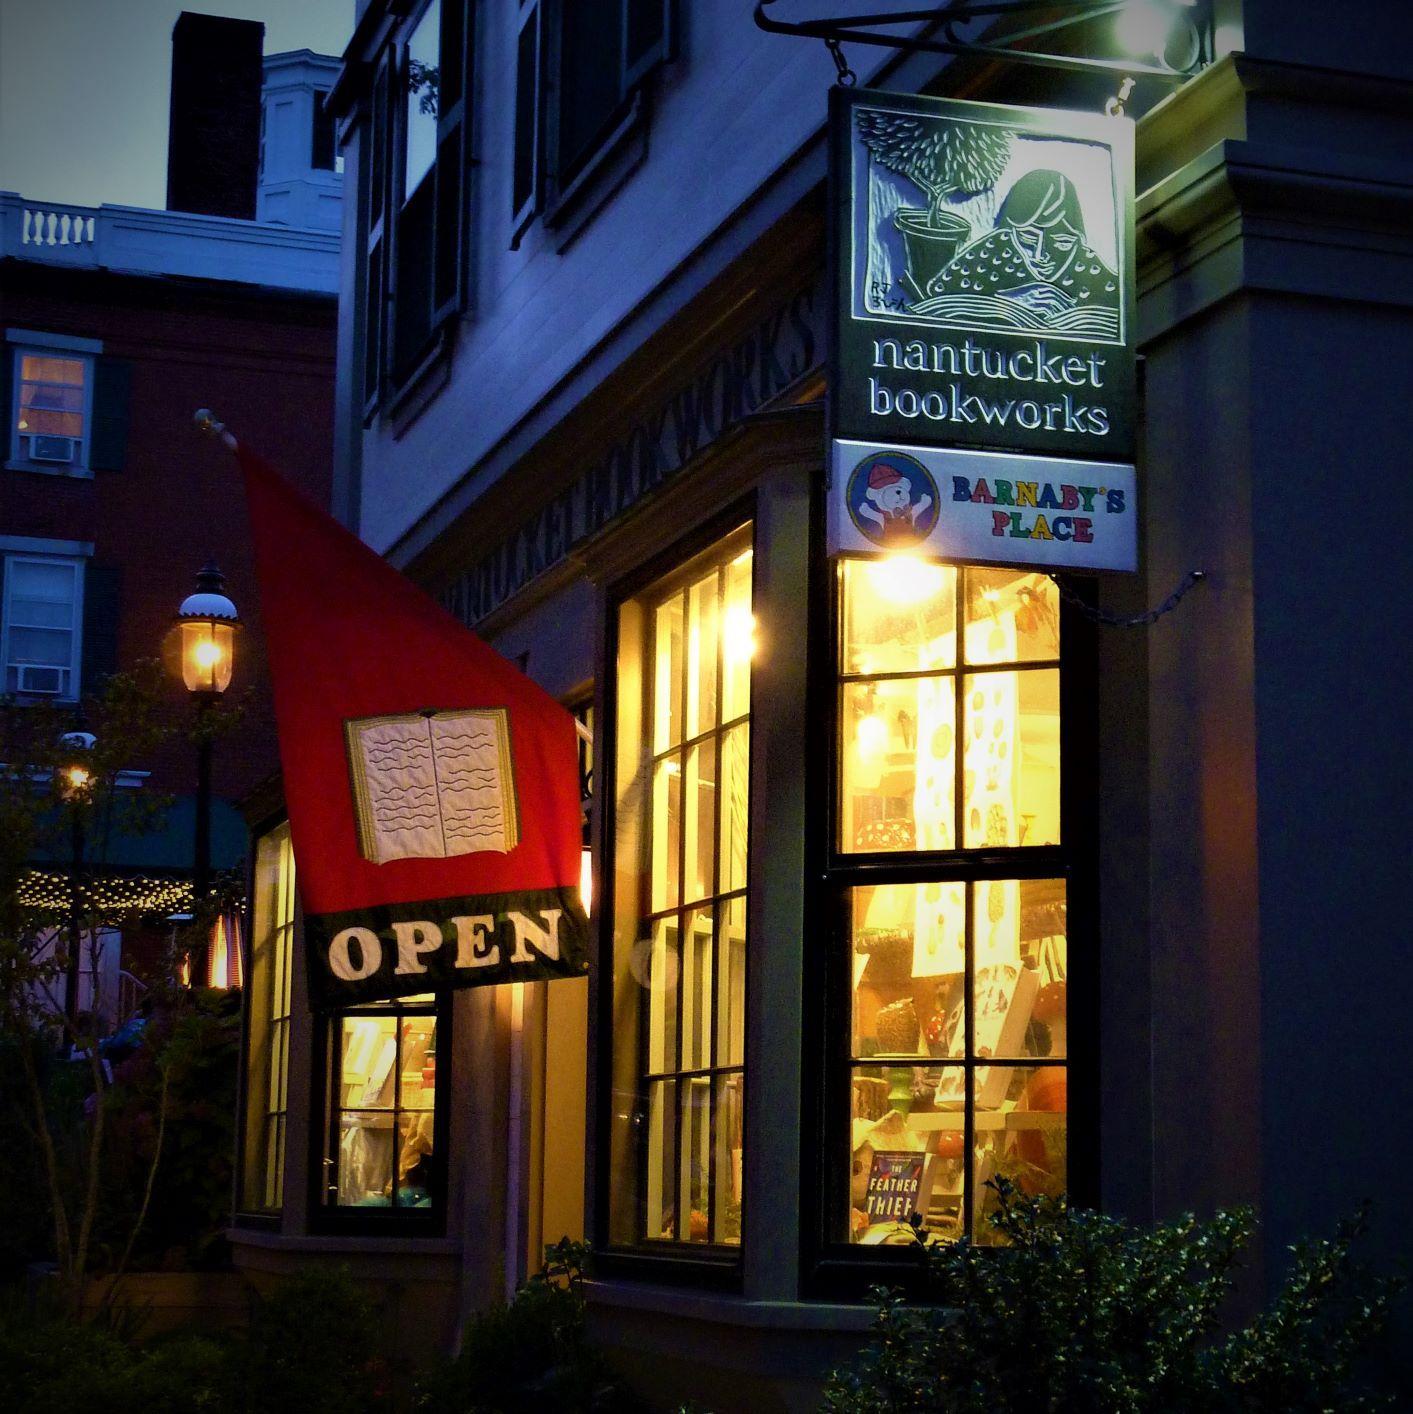 Nantucket Bookworks in Nantucket, MA.